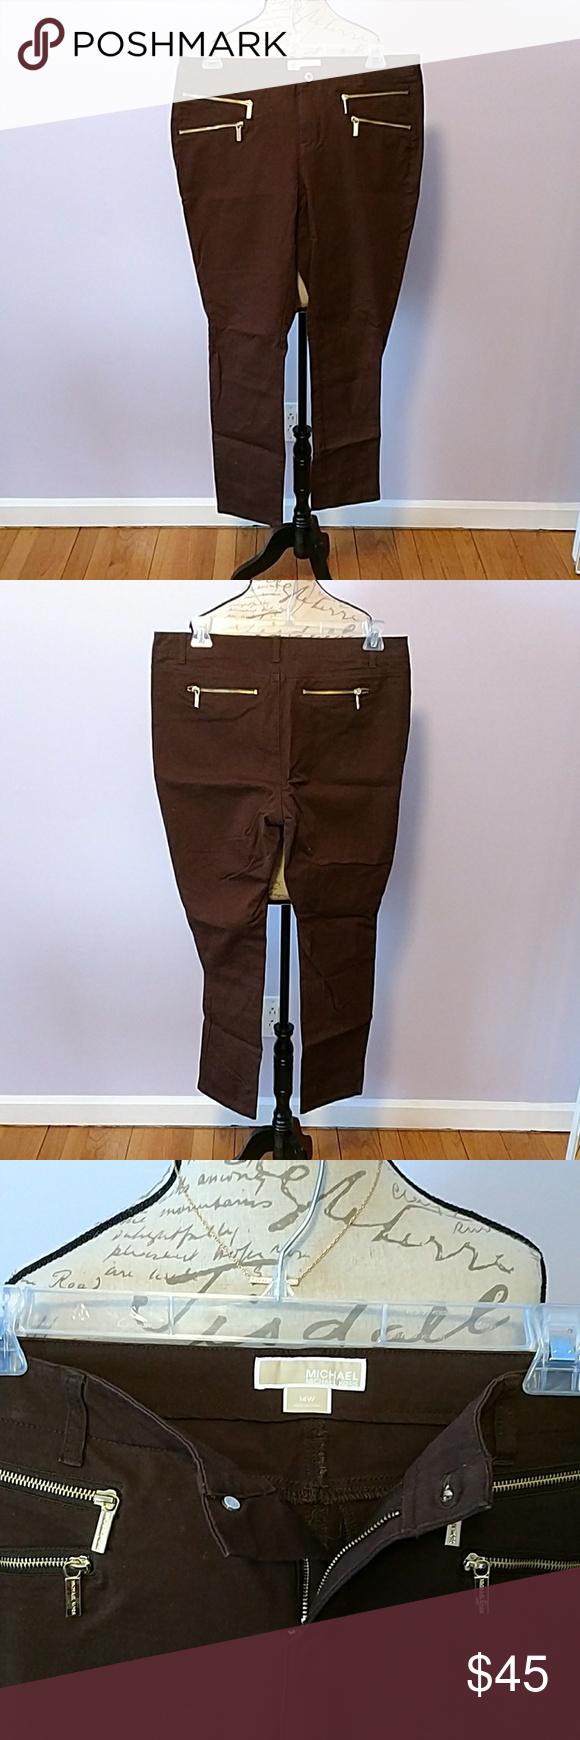 Michael Kors jeans size 14W Michael Kors brown denim, straight leg jeans, with gold accent zippers.  Brand new, no tags. MICHAEL Michael Kors Jeans Straight Leg